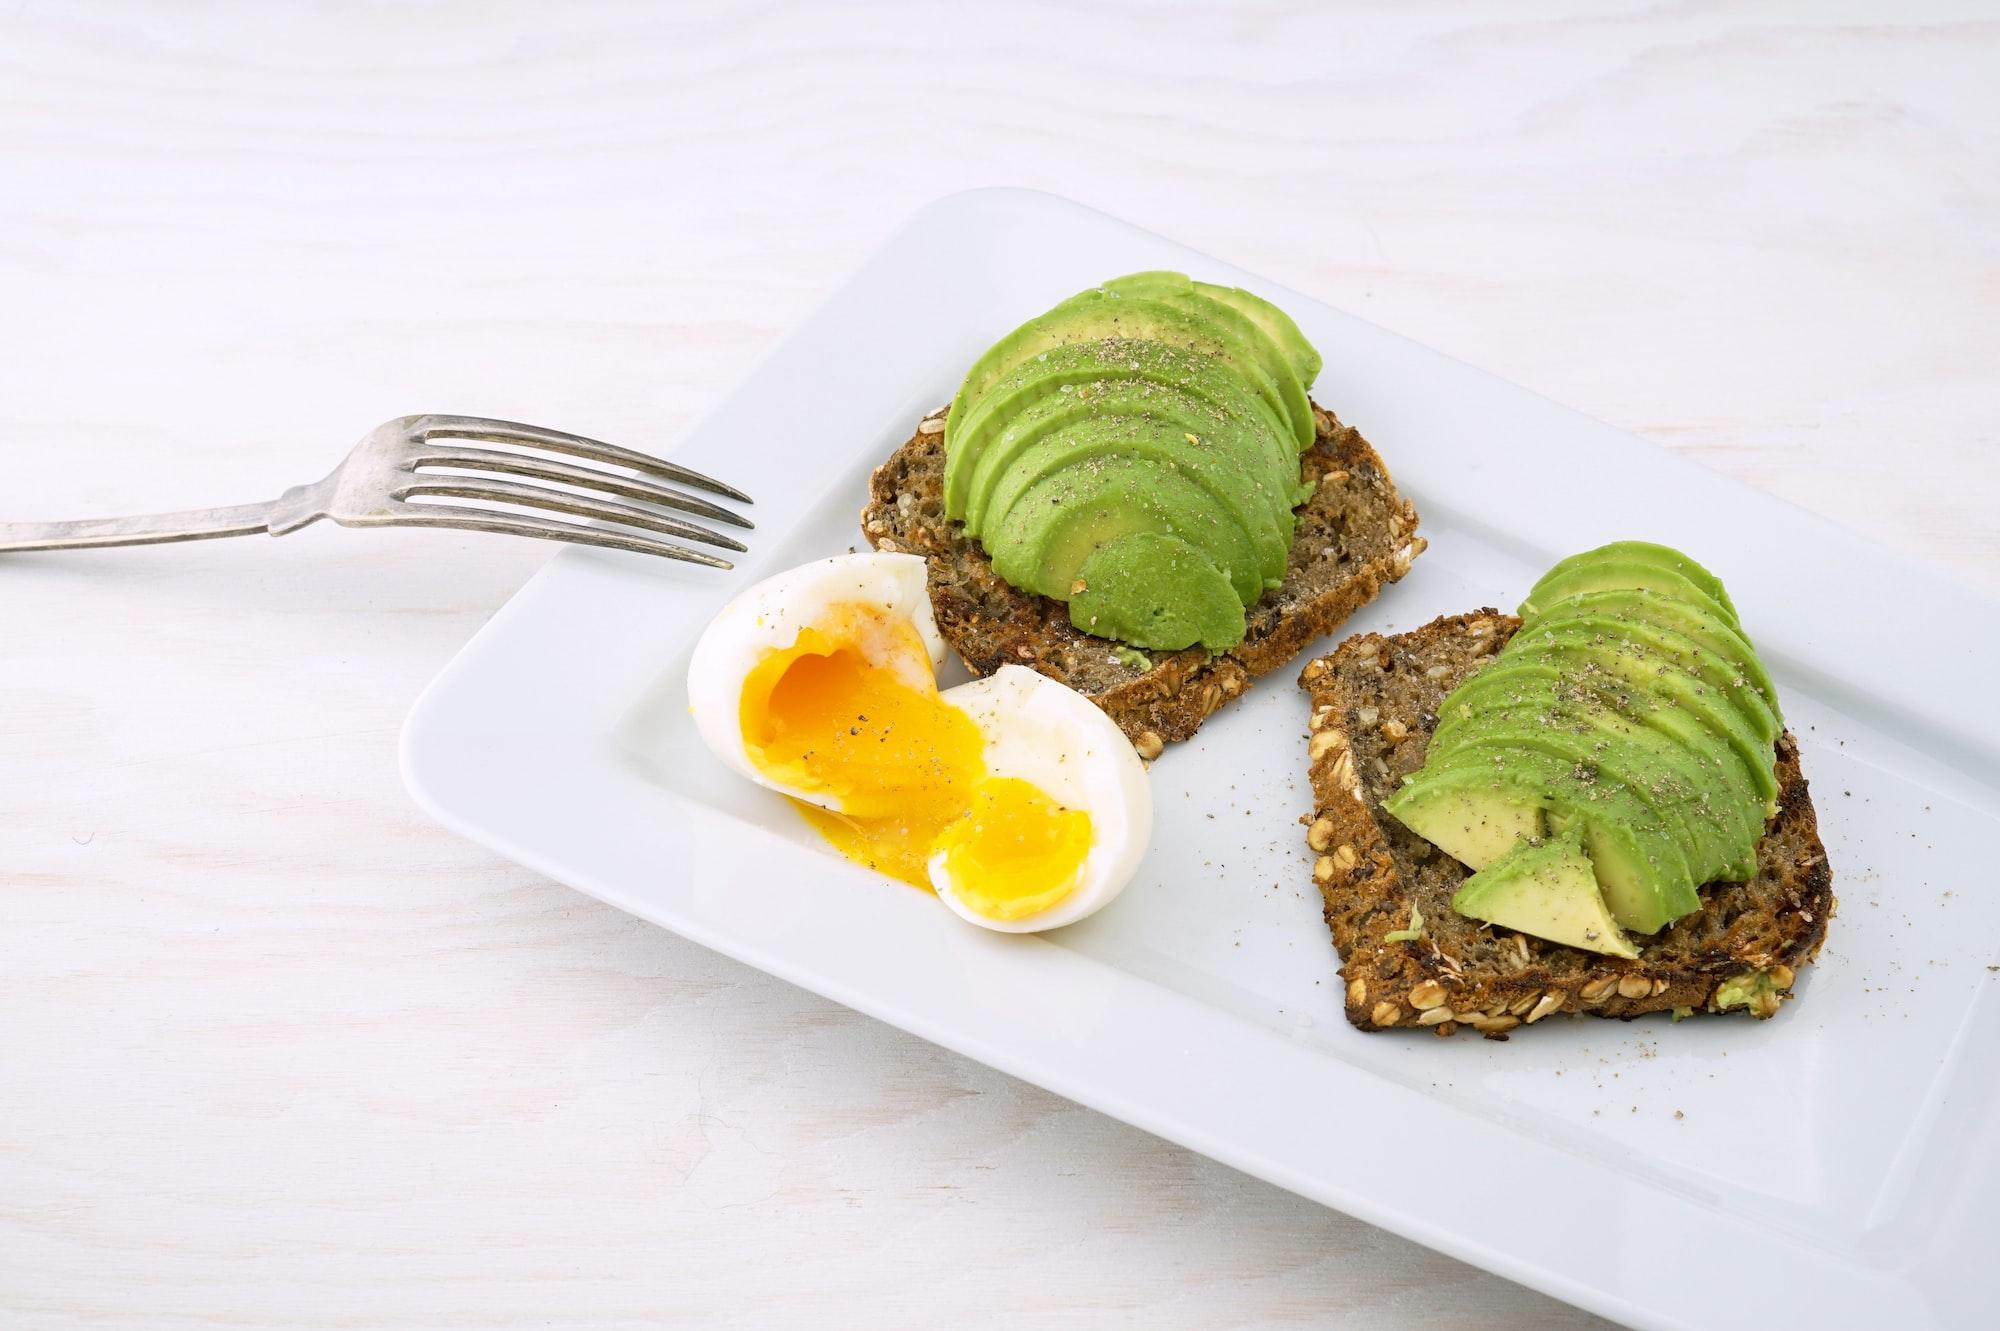 Avocado toast with soft-boiled egg